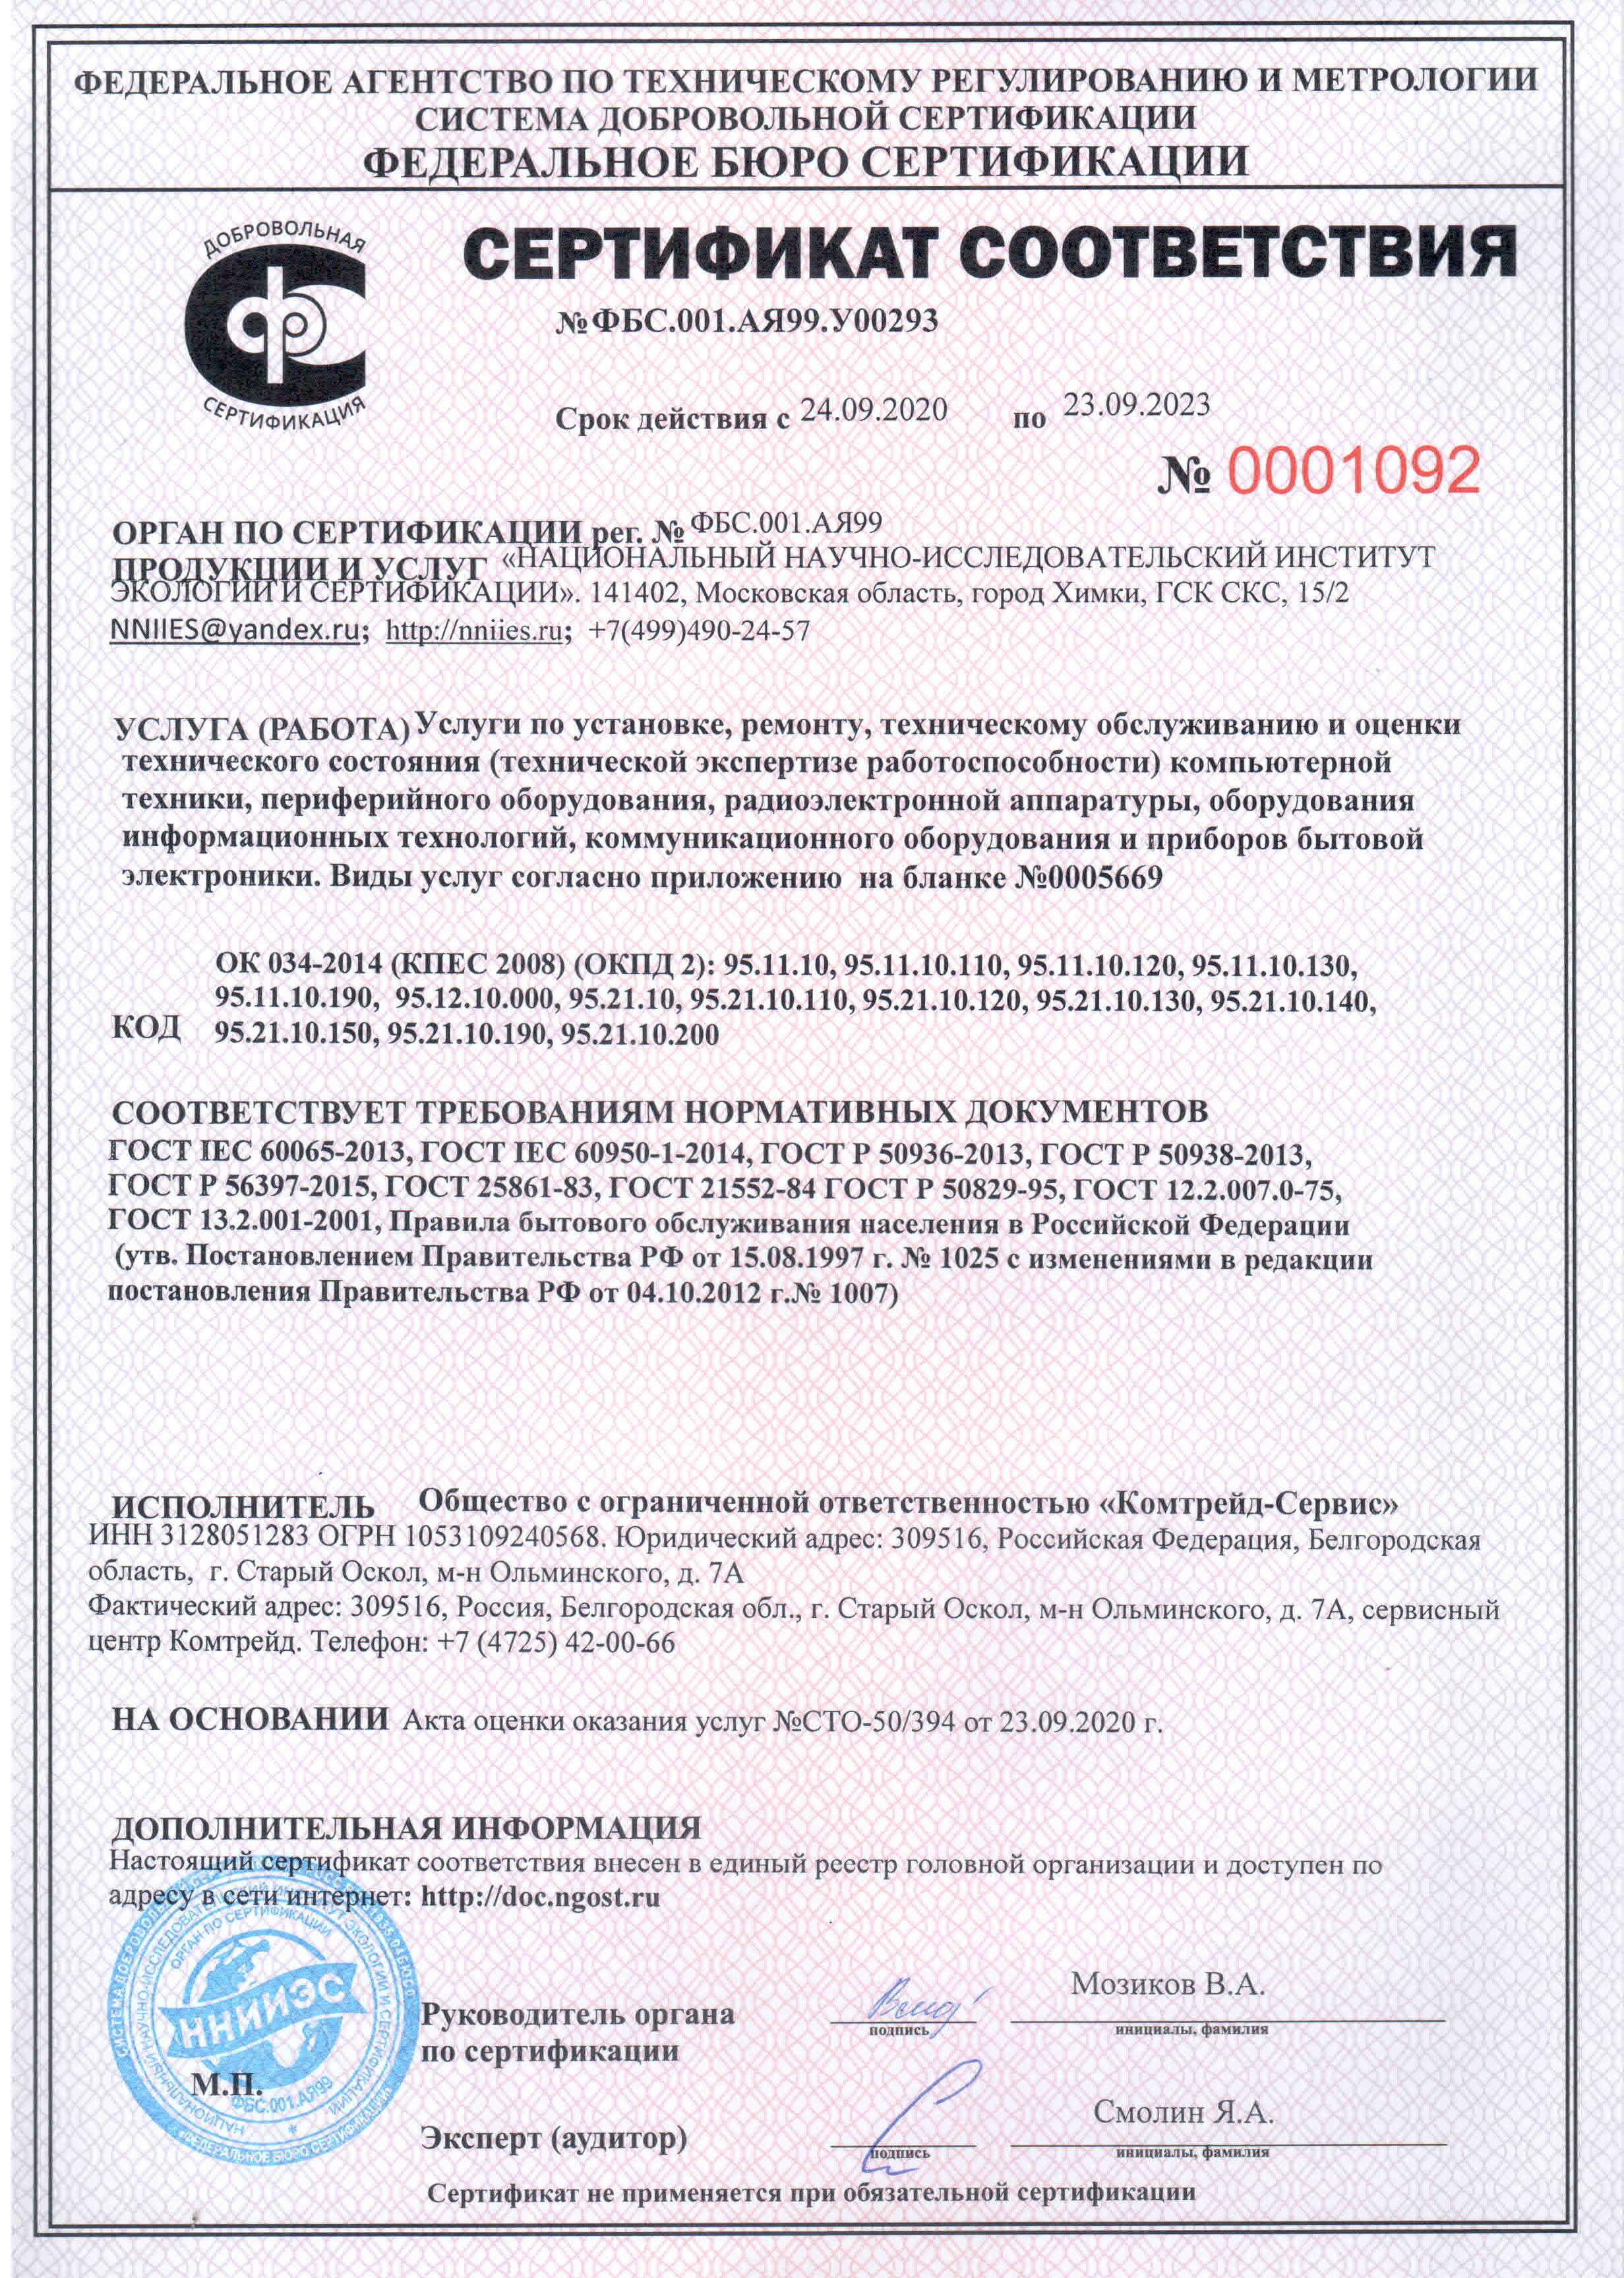 Сертификат 2020 ФБС.001.АЯ99.У00293 Комтрейд Сервис - 0001